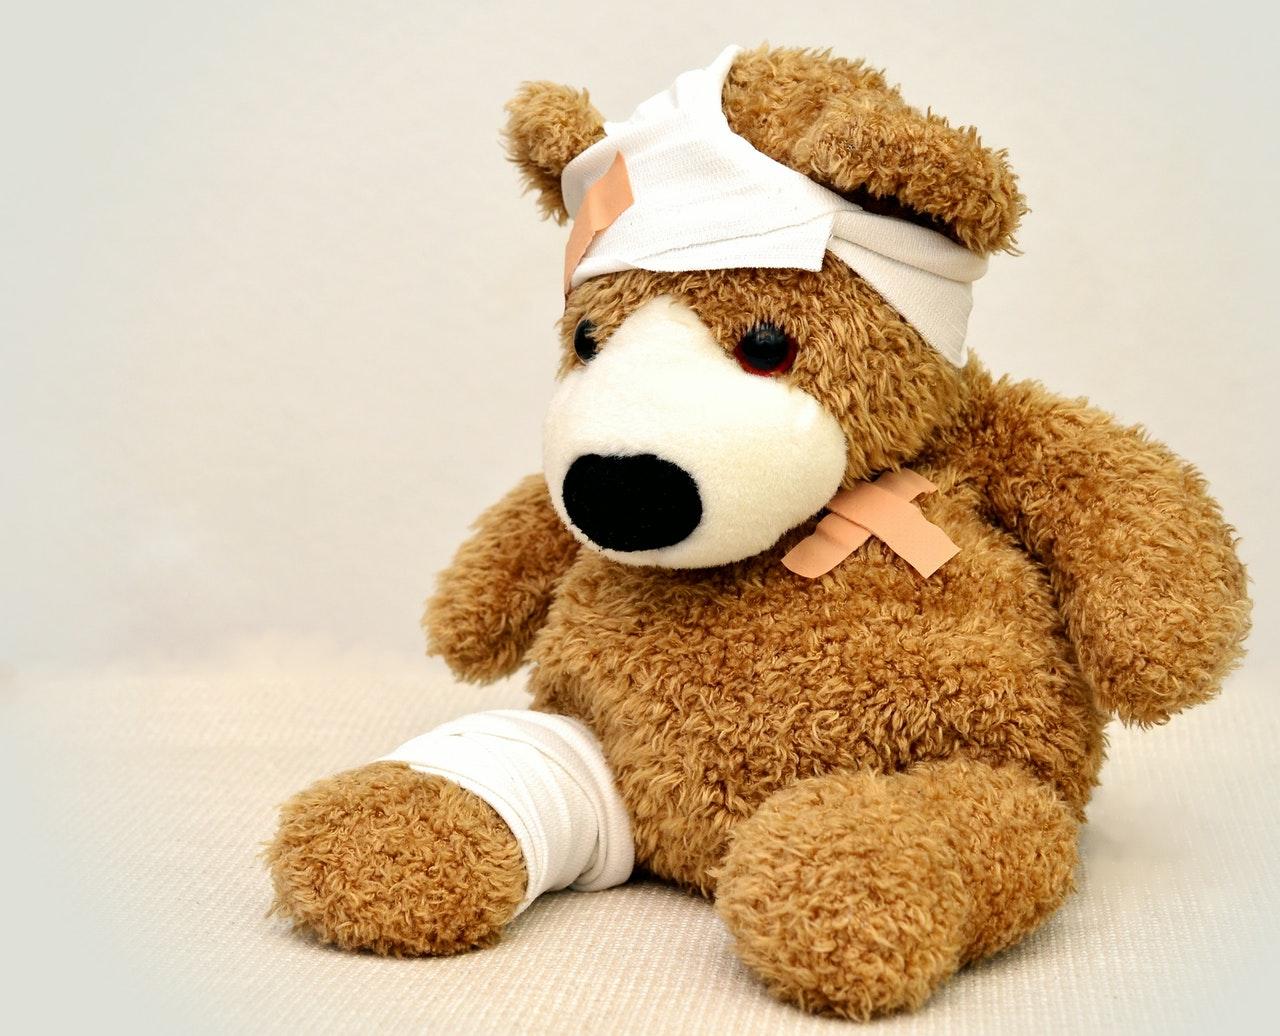 child brain injury houston car accident lawyer